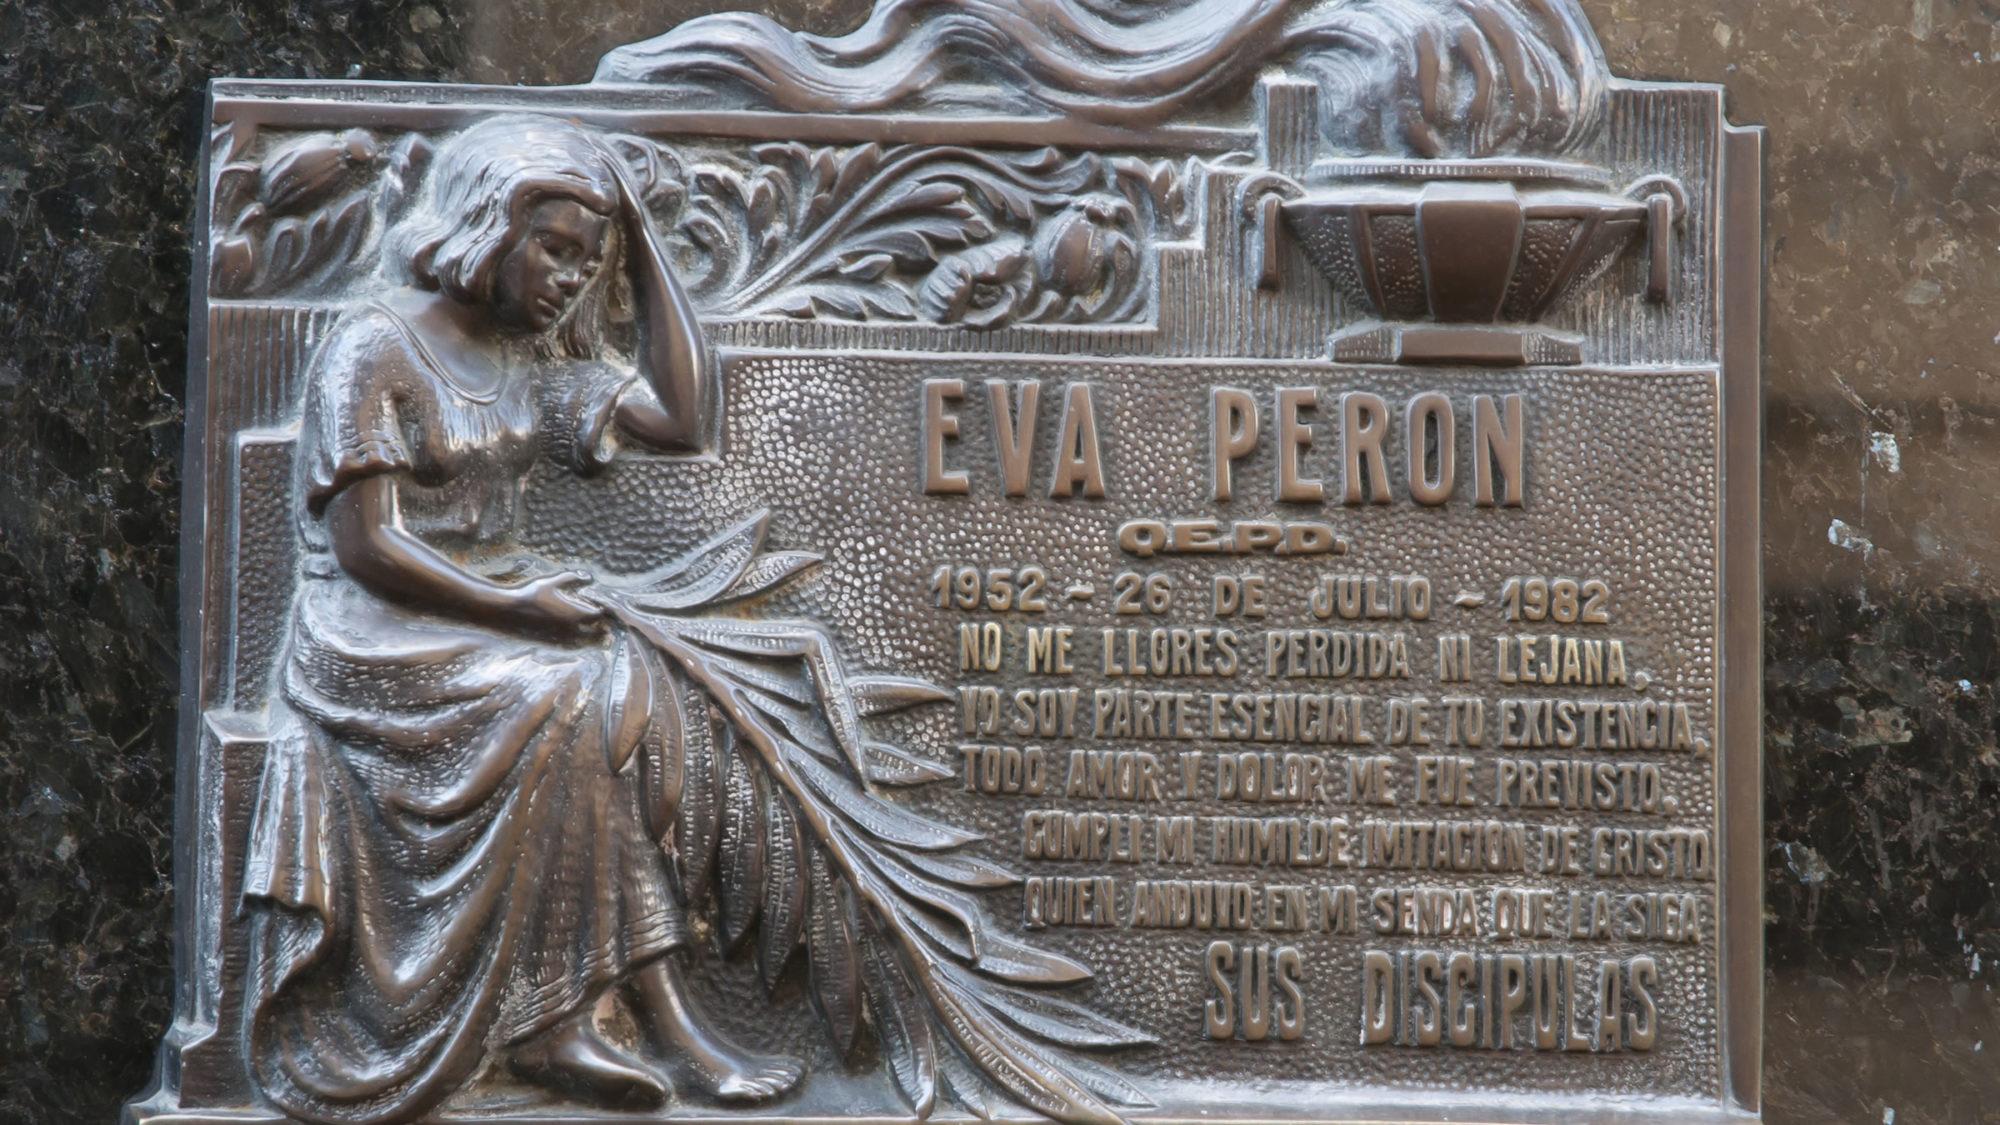 TOMBA EVITA PERON